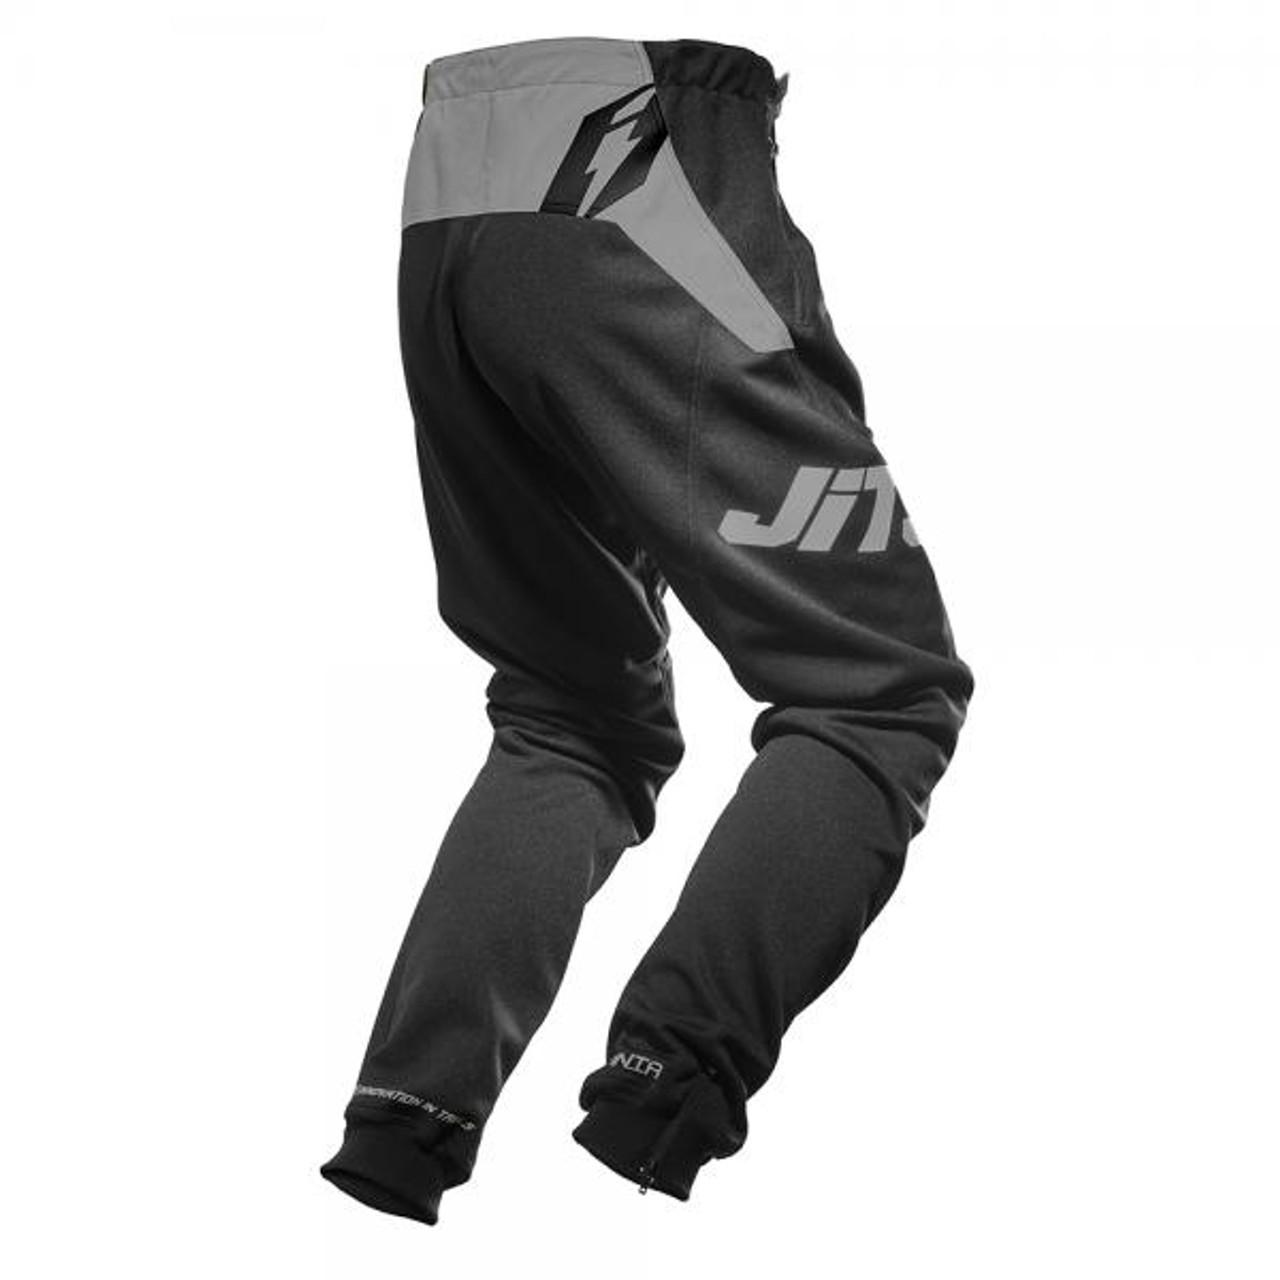 Pants Omnia black/ silver